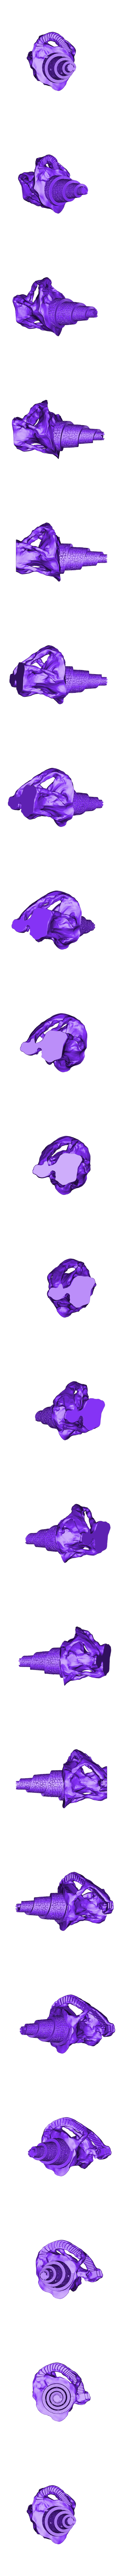 twisted_tower_merged.stl Download free STL file Twisted Tower • 3D printer model, kijai